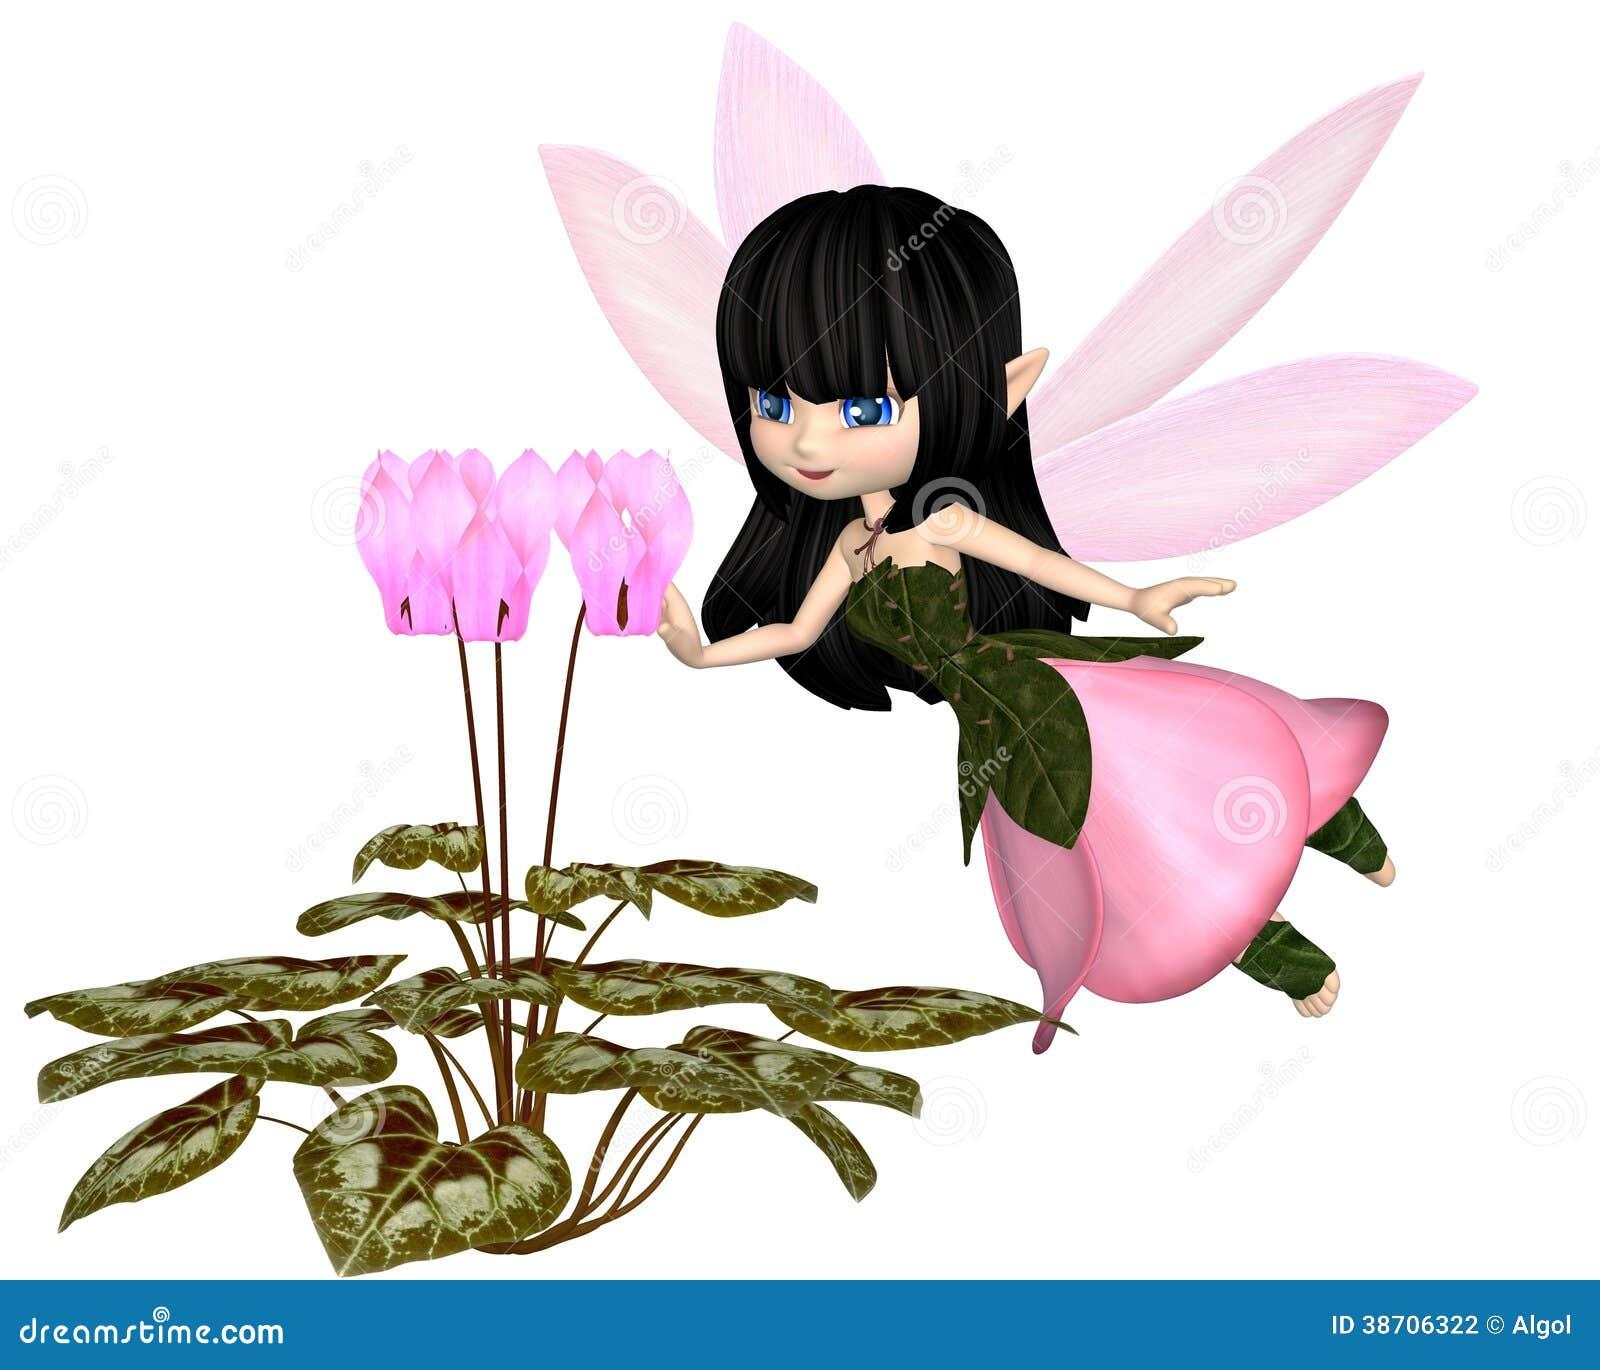 Cute Toon Pink Cyclamen Fairy, Flying